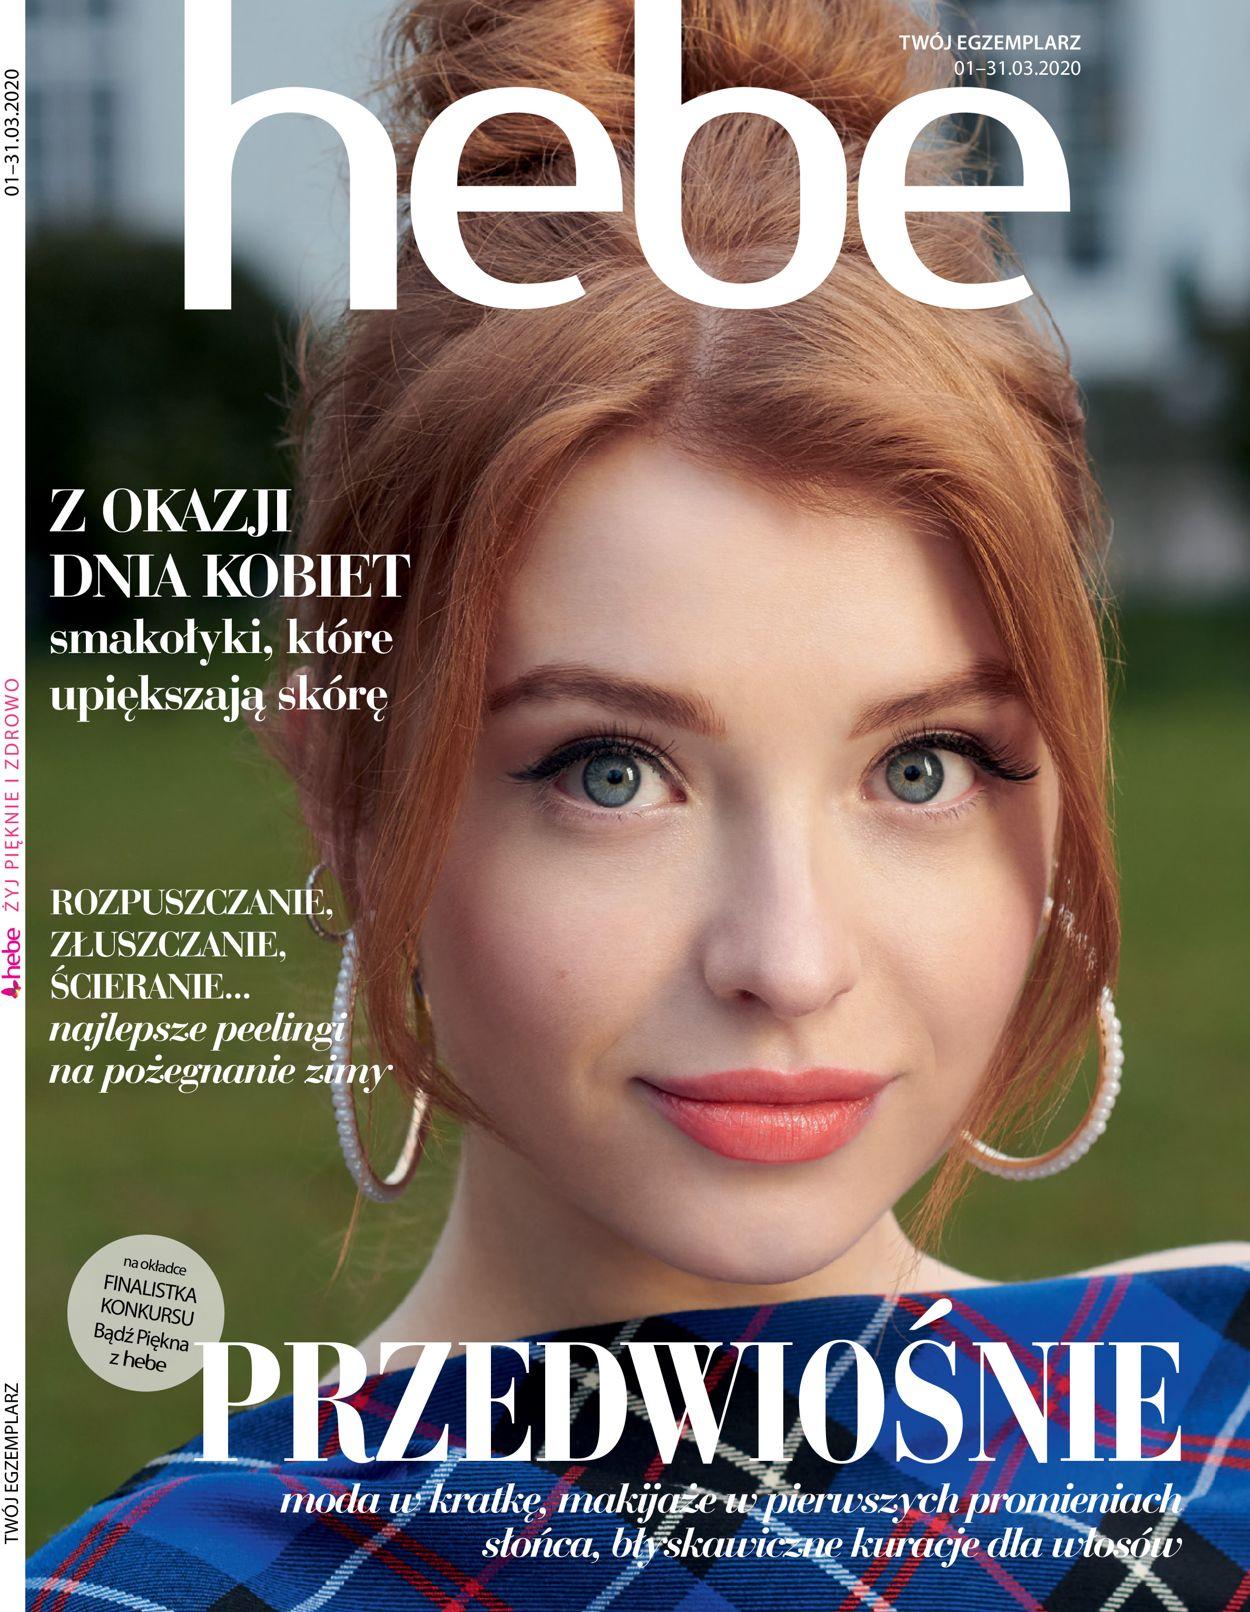 Gazetka promocyjna Hebe - 01.03-31.03.2020